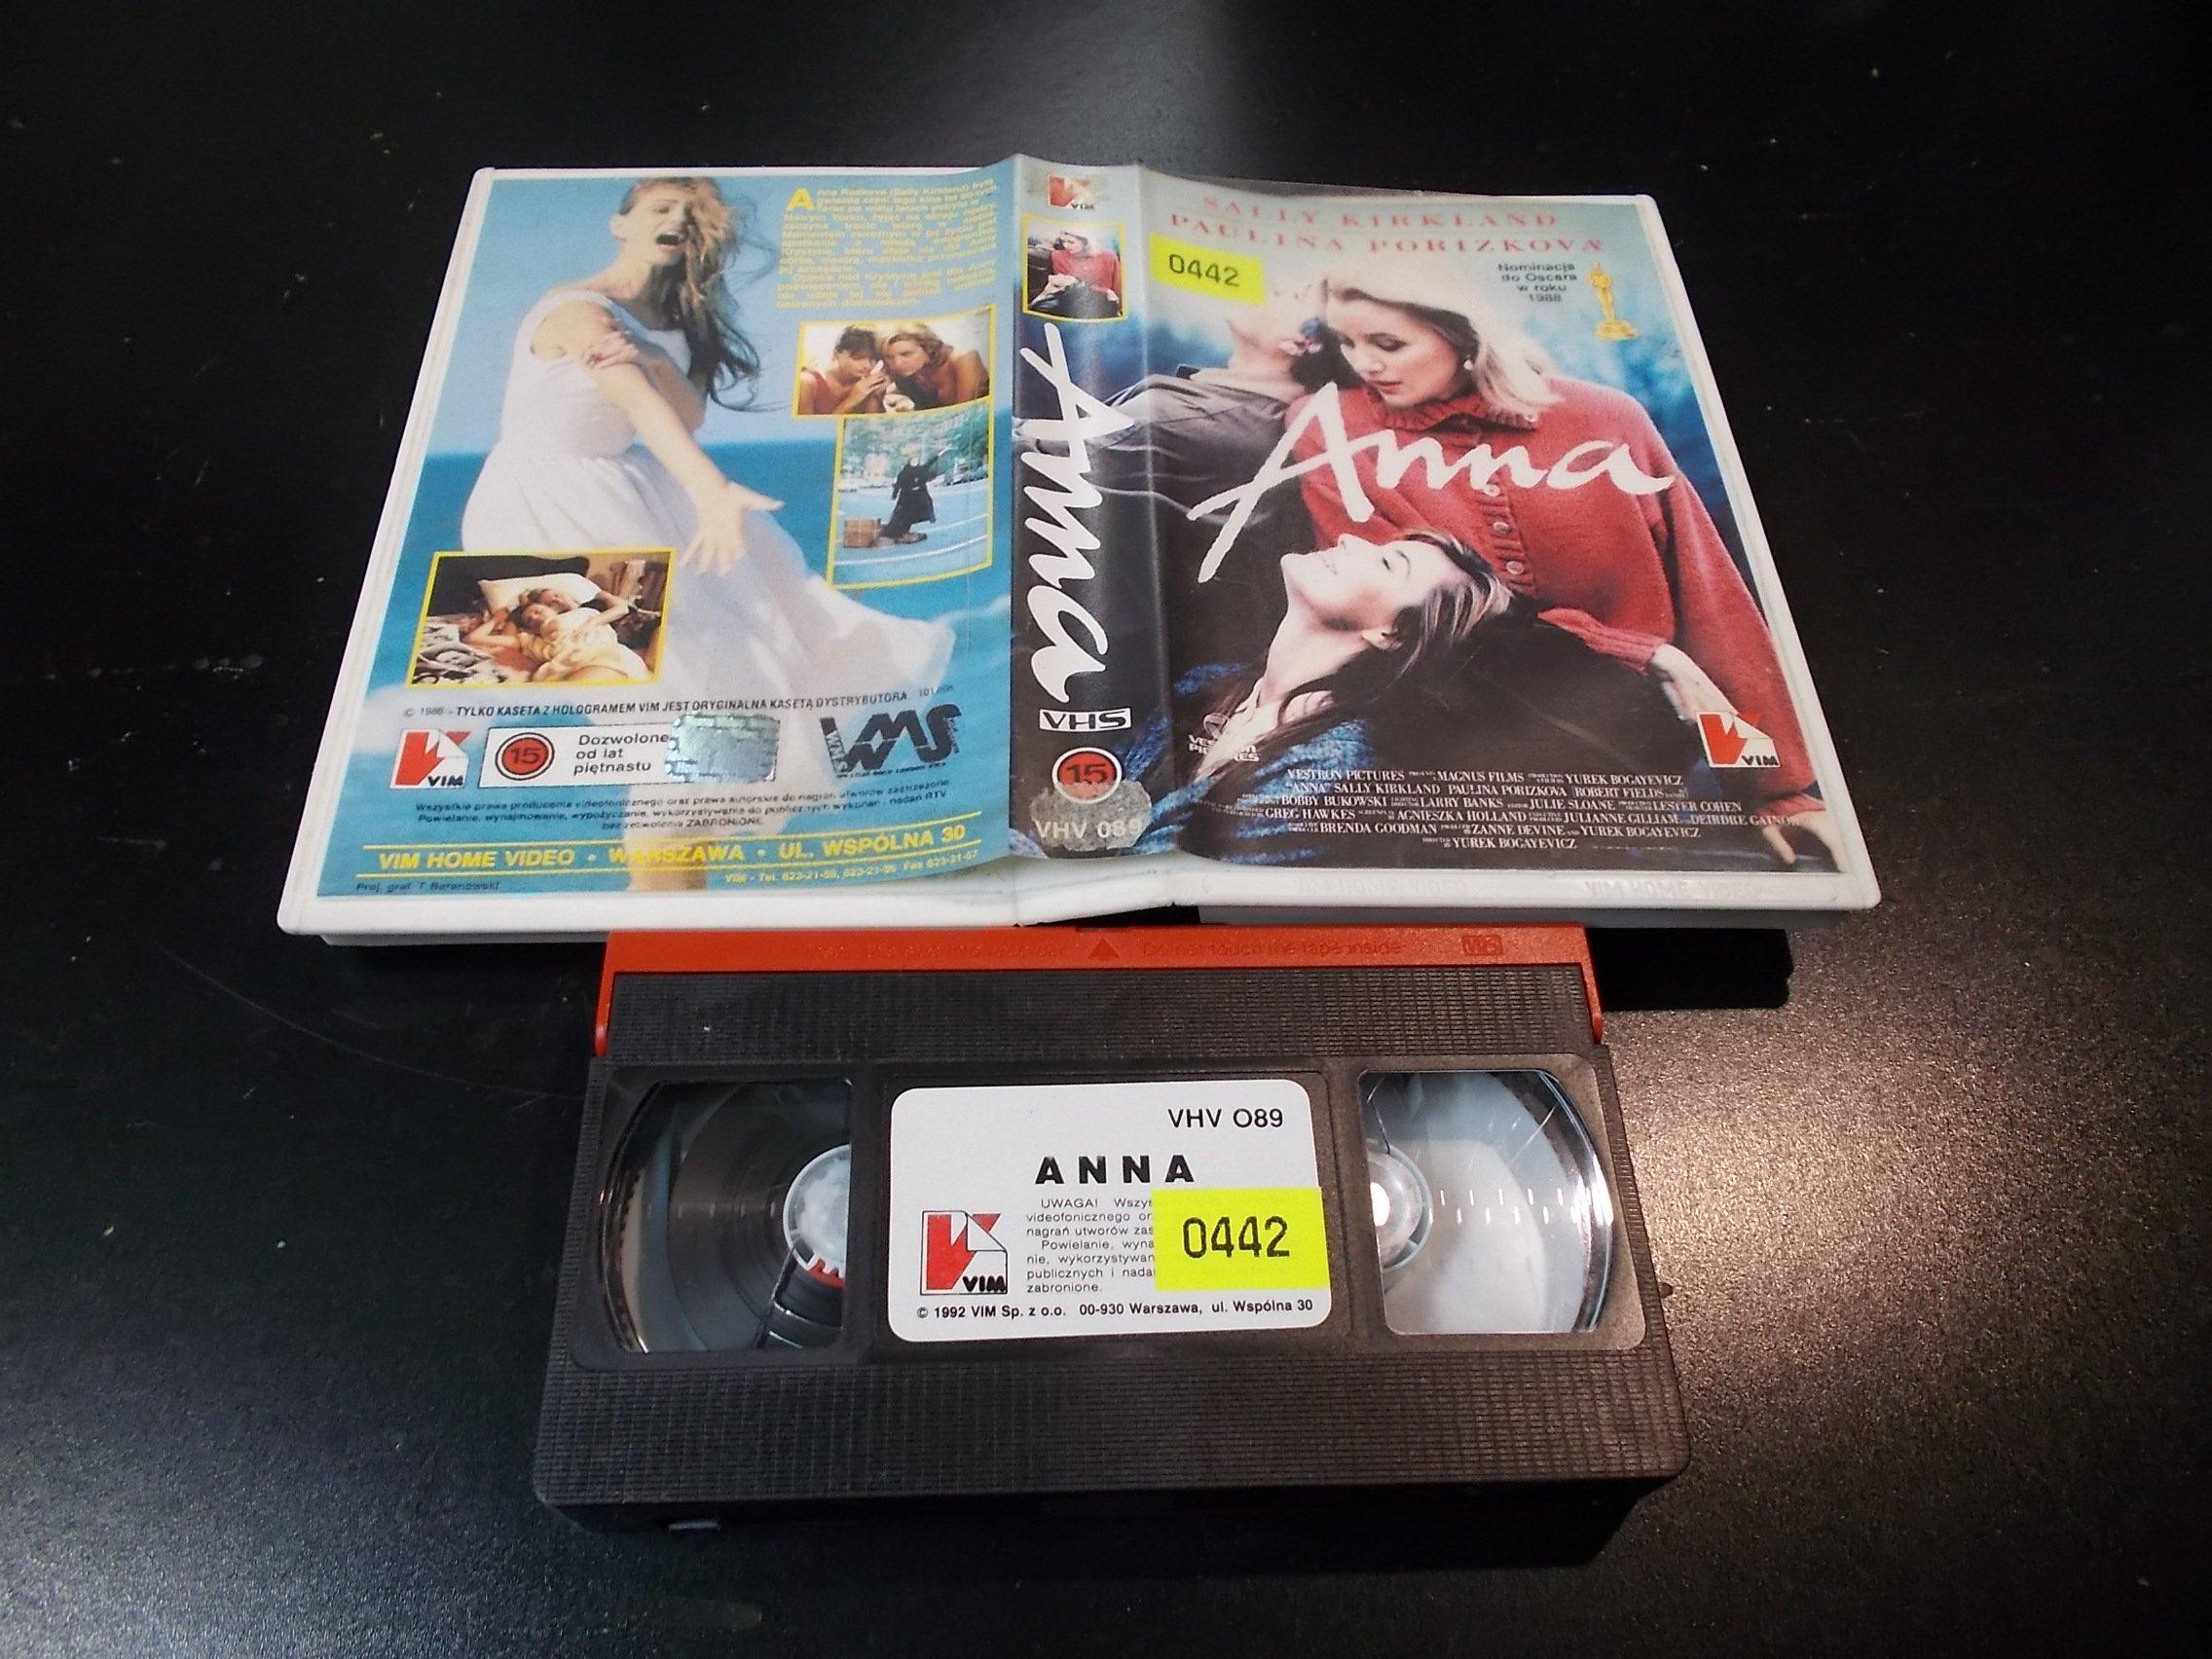 ANNA - kaseta Video VHS - 1400 Sklep